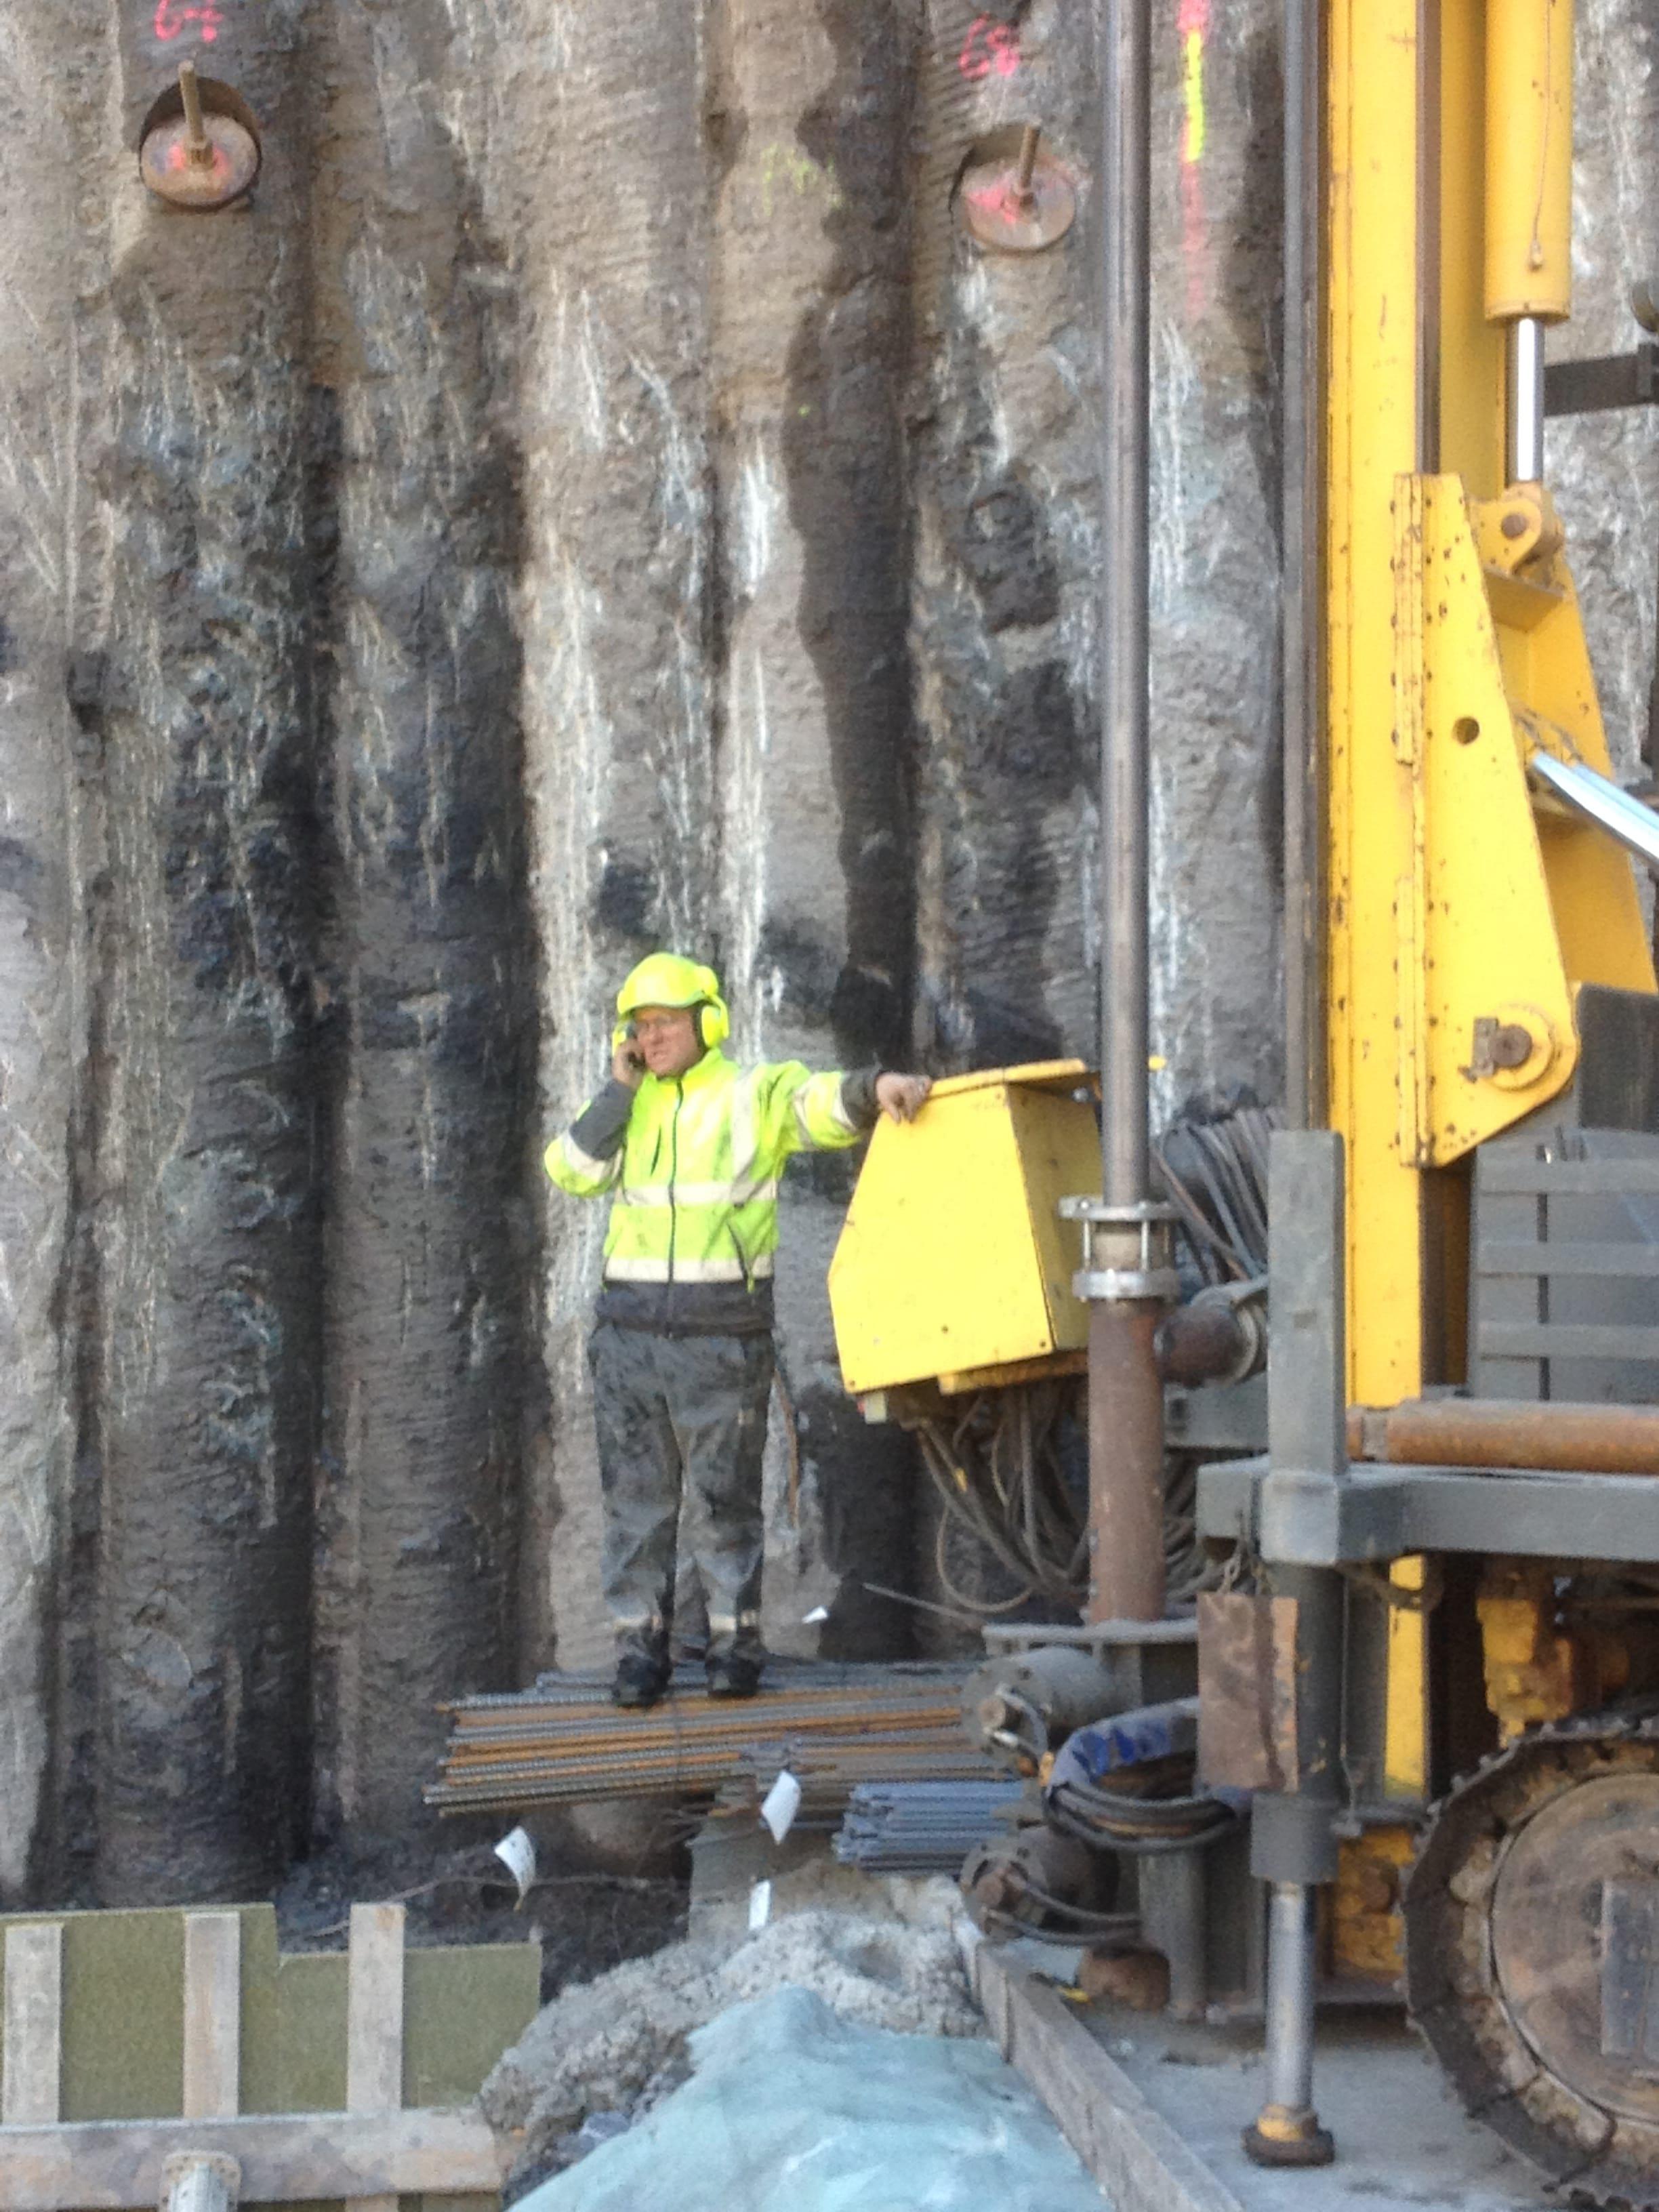 chantier-charleroi-rive-gauche-forage-installation-pompe-puits-geothermie-eurodrill-liege-belgique-6